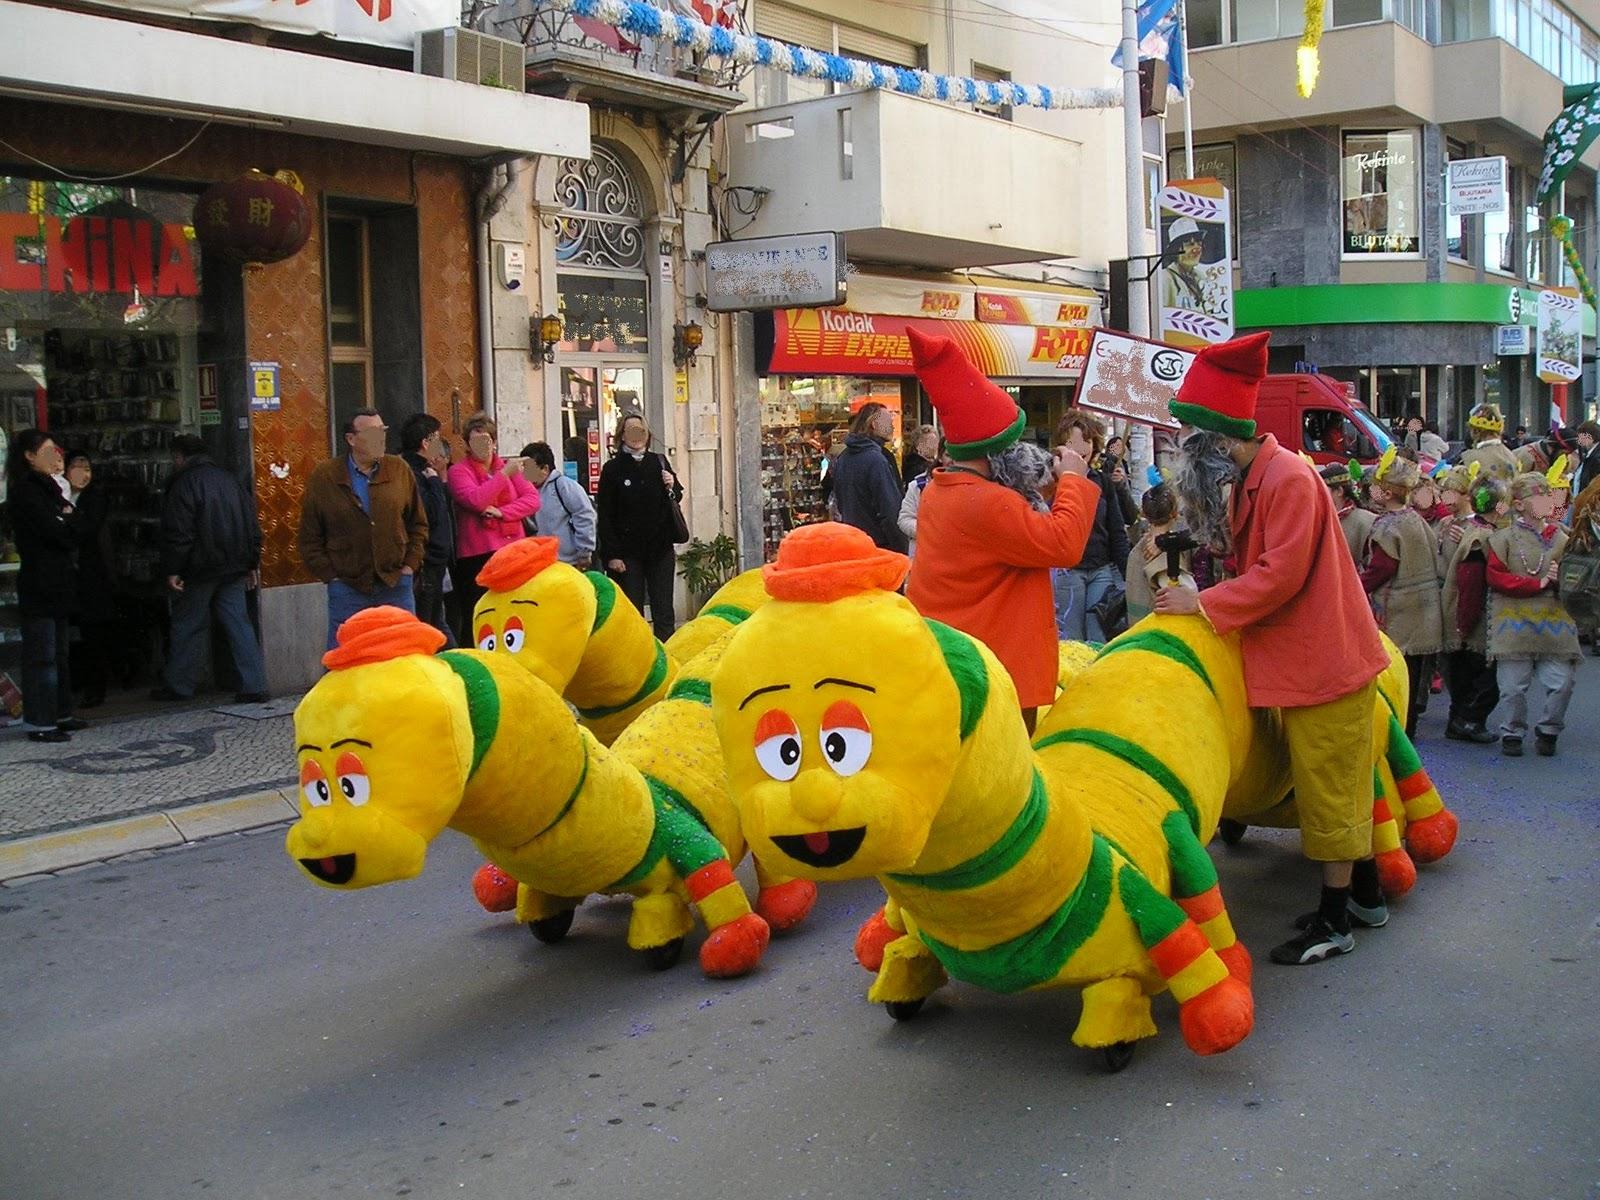 39 blog sur le portugal to discover portugal 39 - Idee pour le carnaval ...